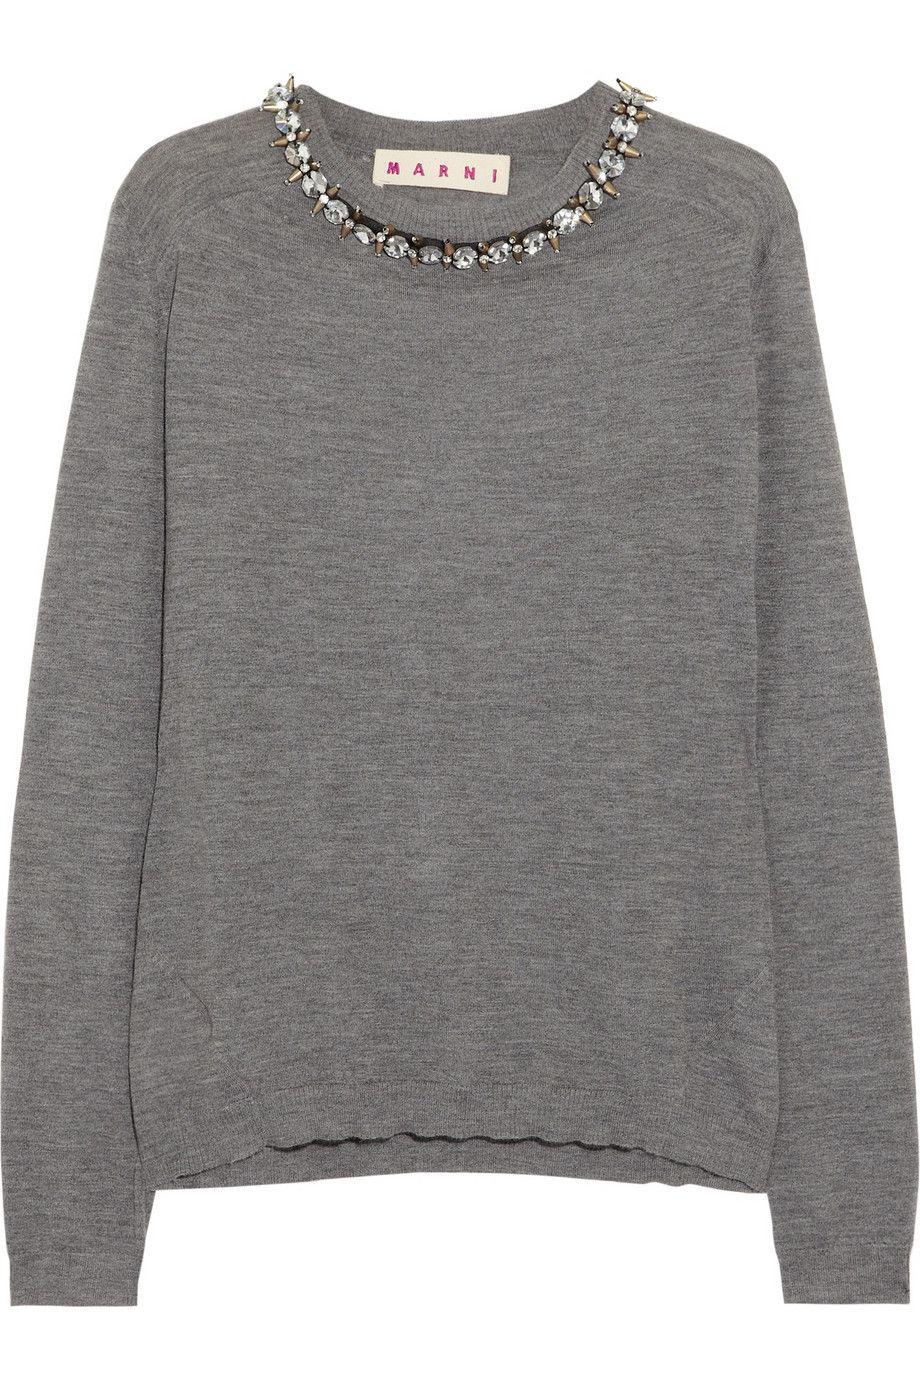 Marni Embellished Cashmere Sweater Net A Portercom Buy Me